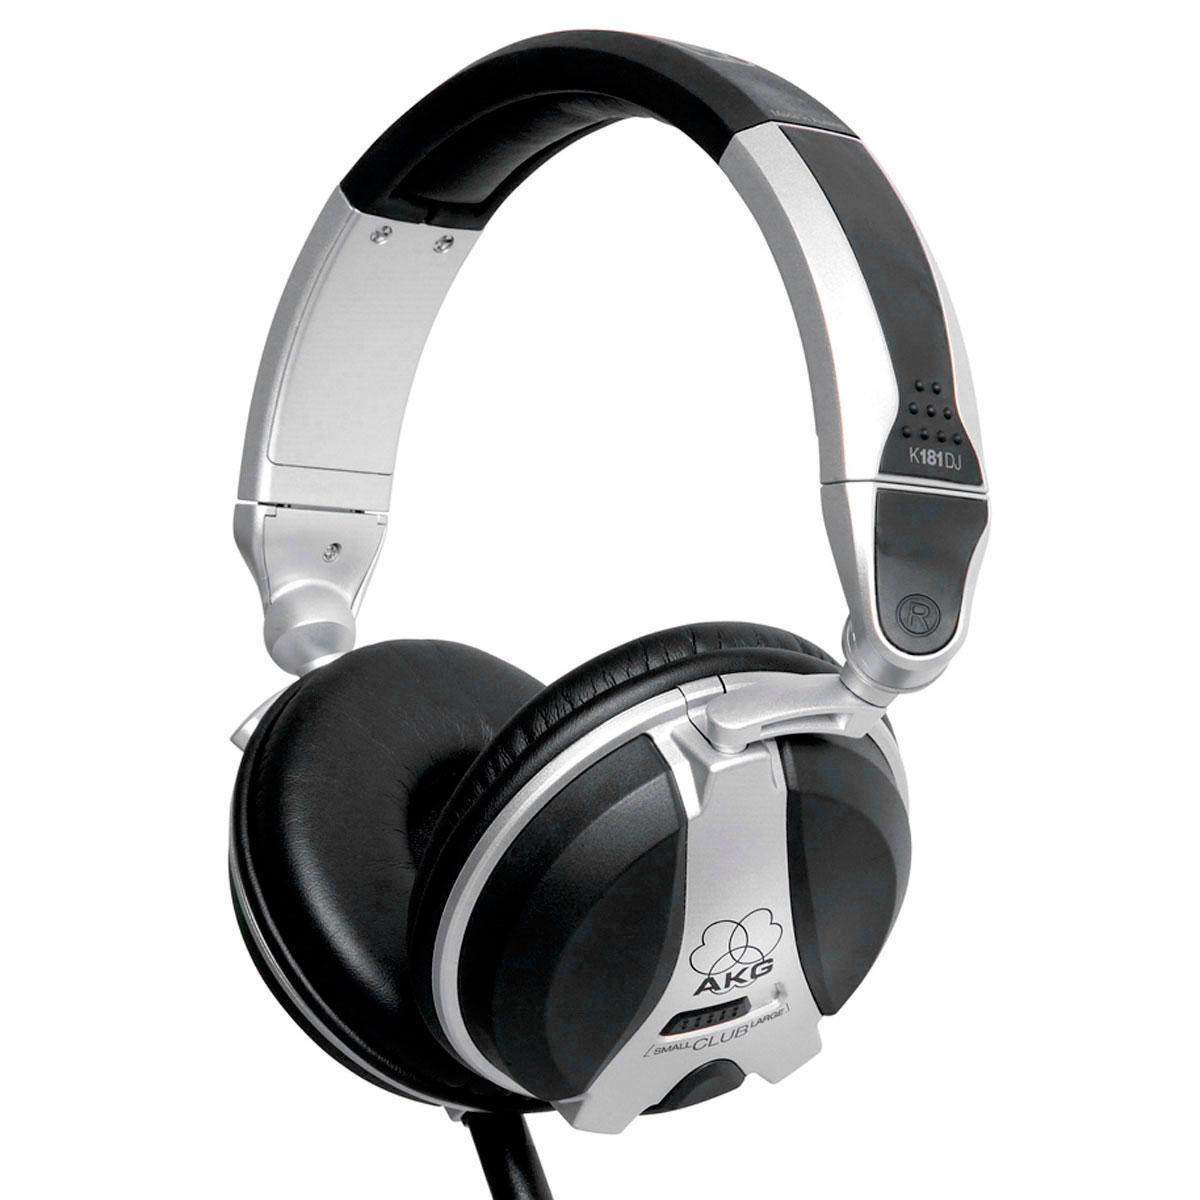 Fone de Ouvido Over-ear p/ DJ 5Hz - 30KHz 42 Ohms K 181 DJ - AKG